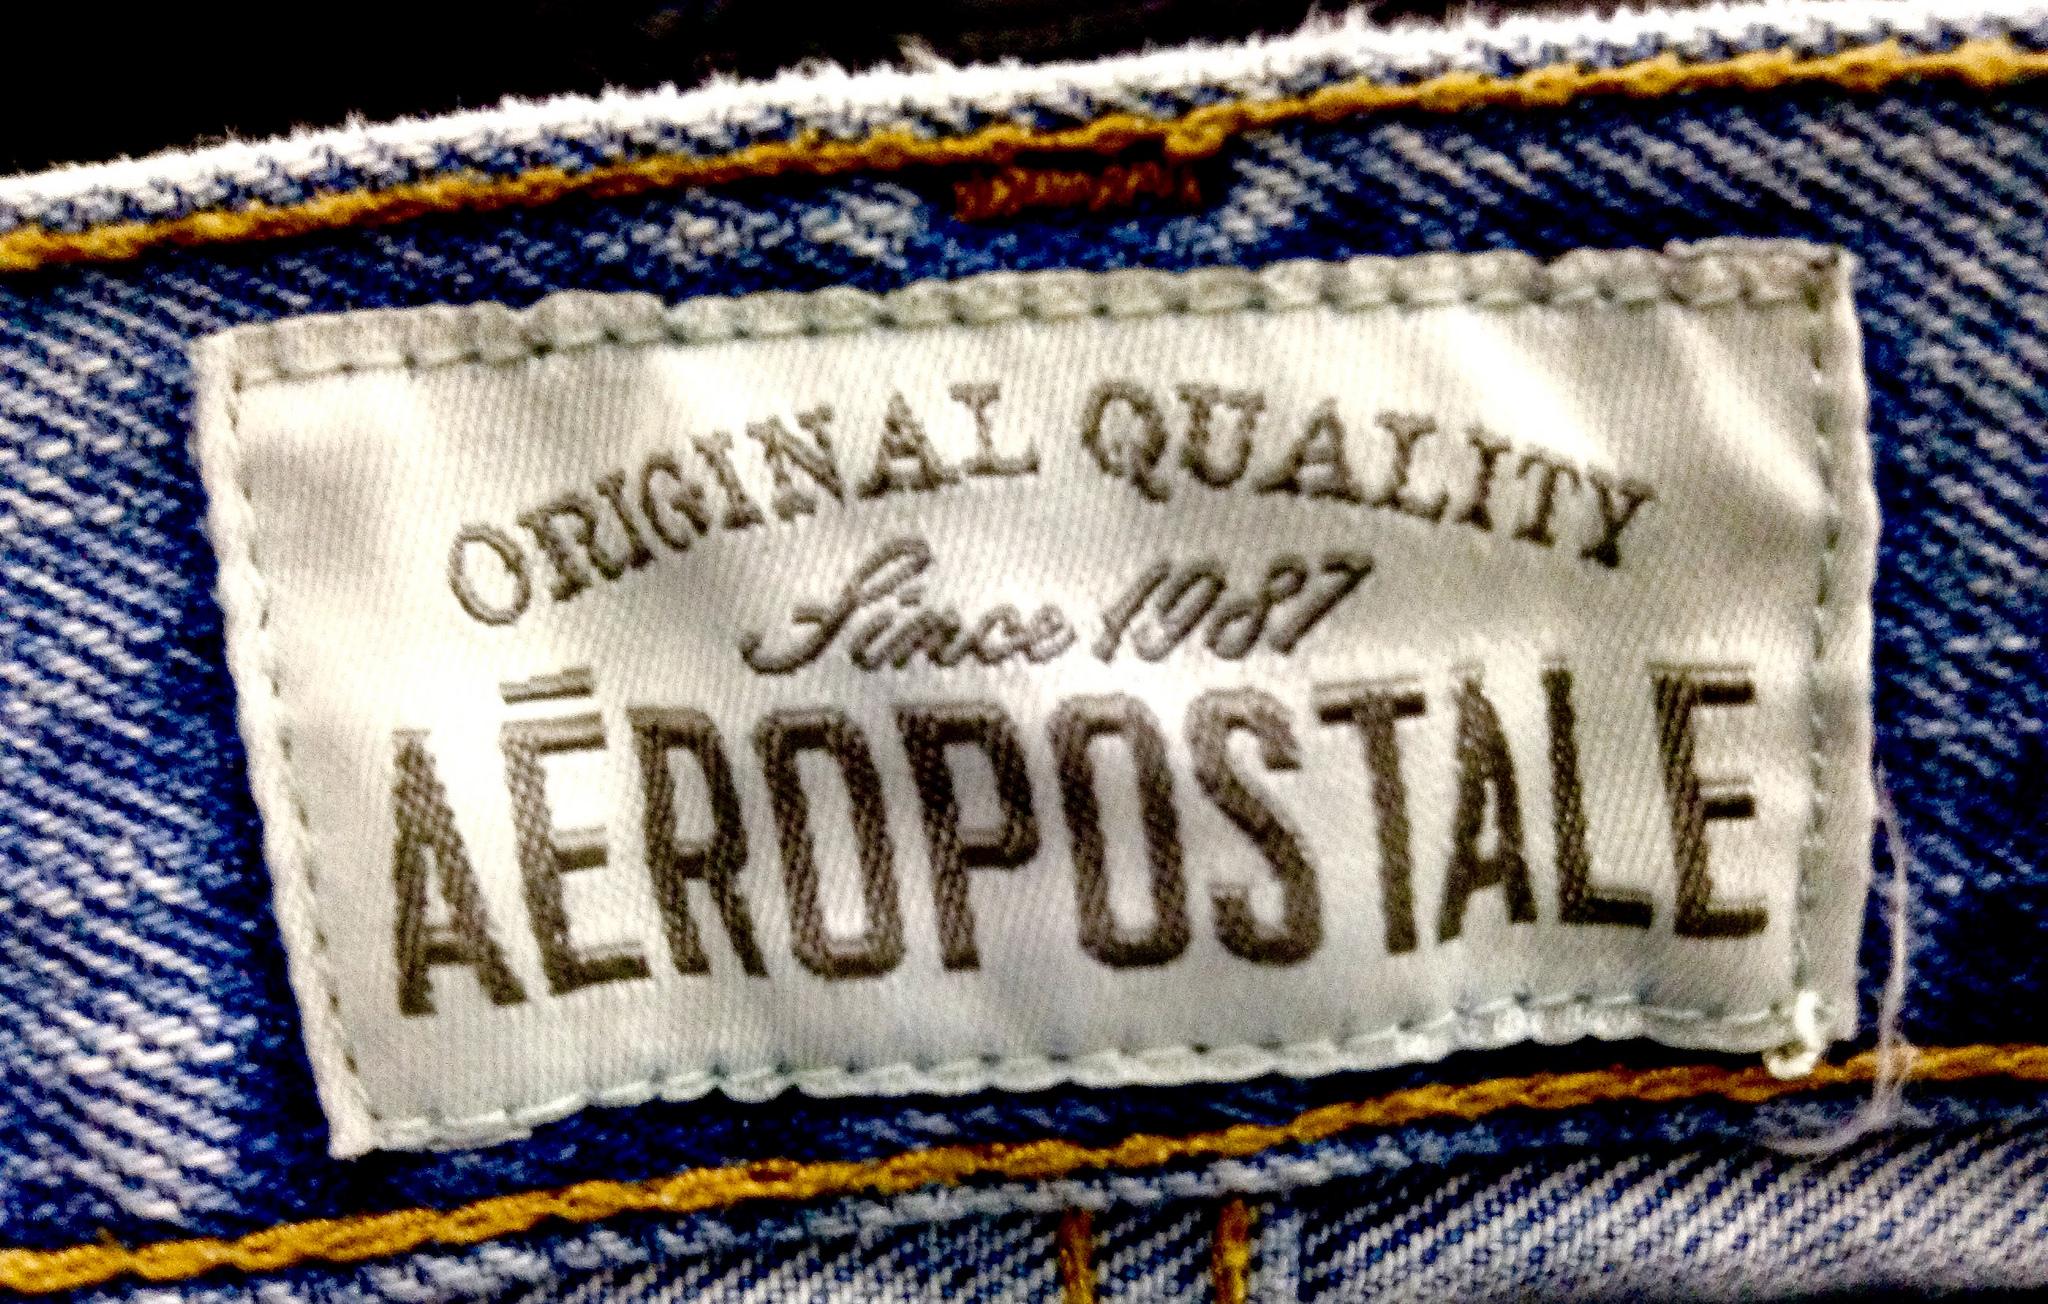 Aeropostale Jeans Label